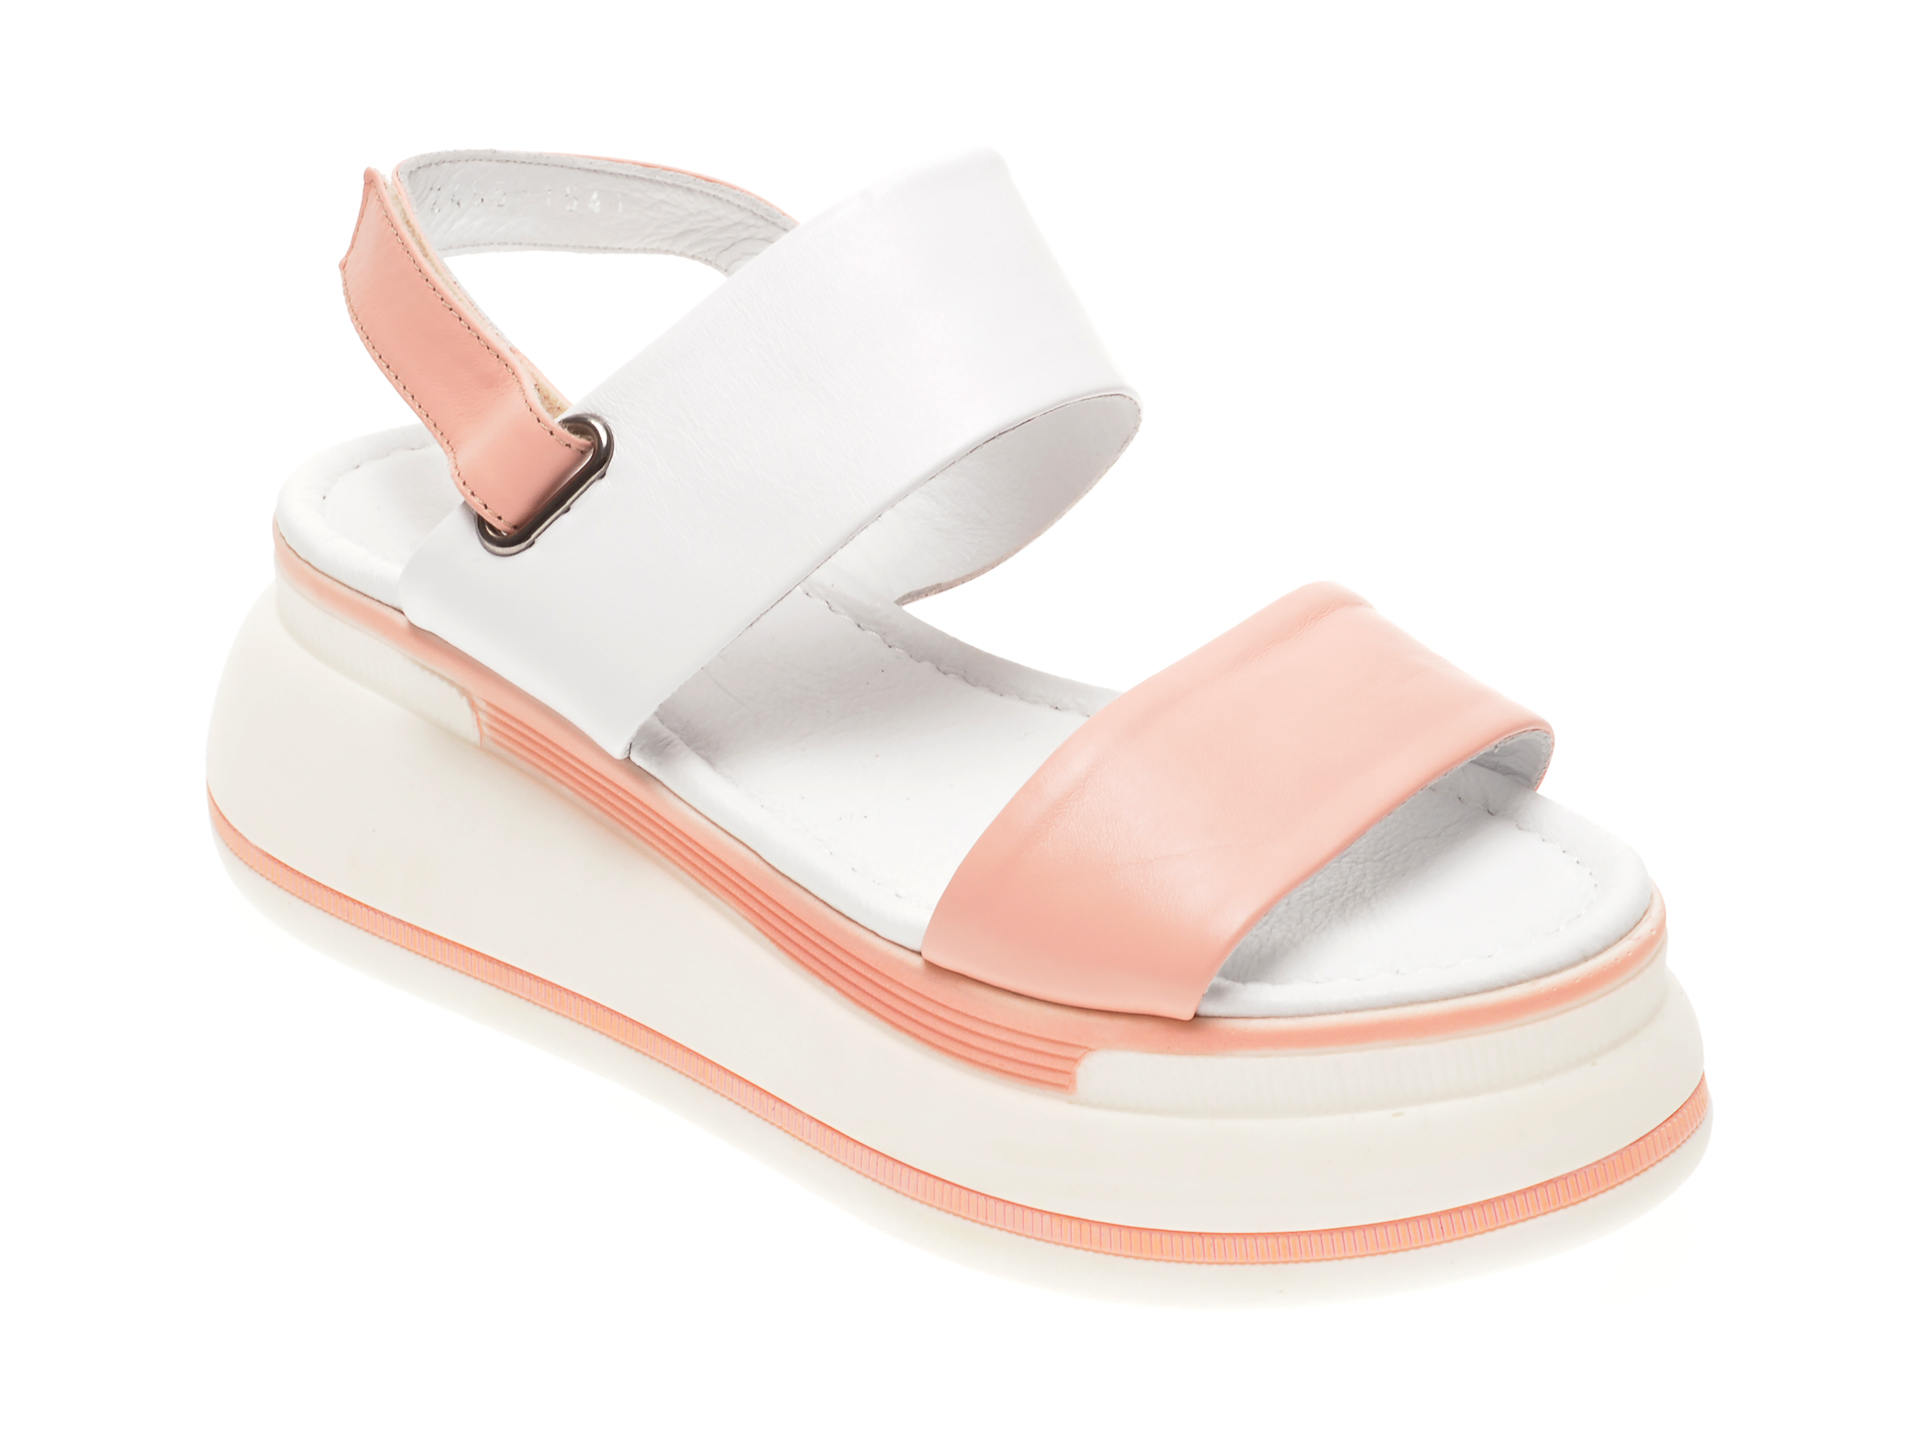 Sandale FLAVIA PASSINI roz, 1182485, din piele naturala